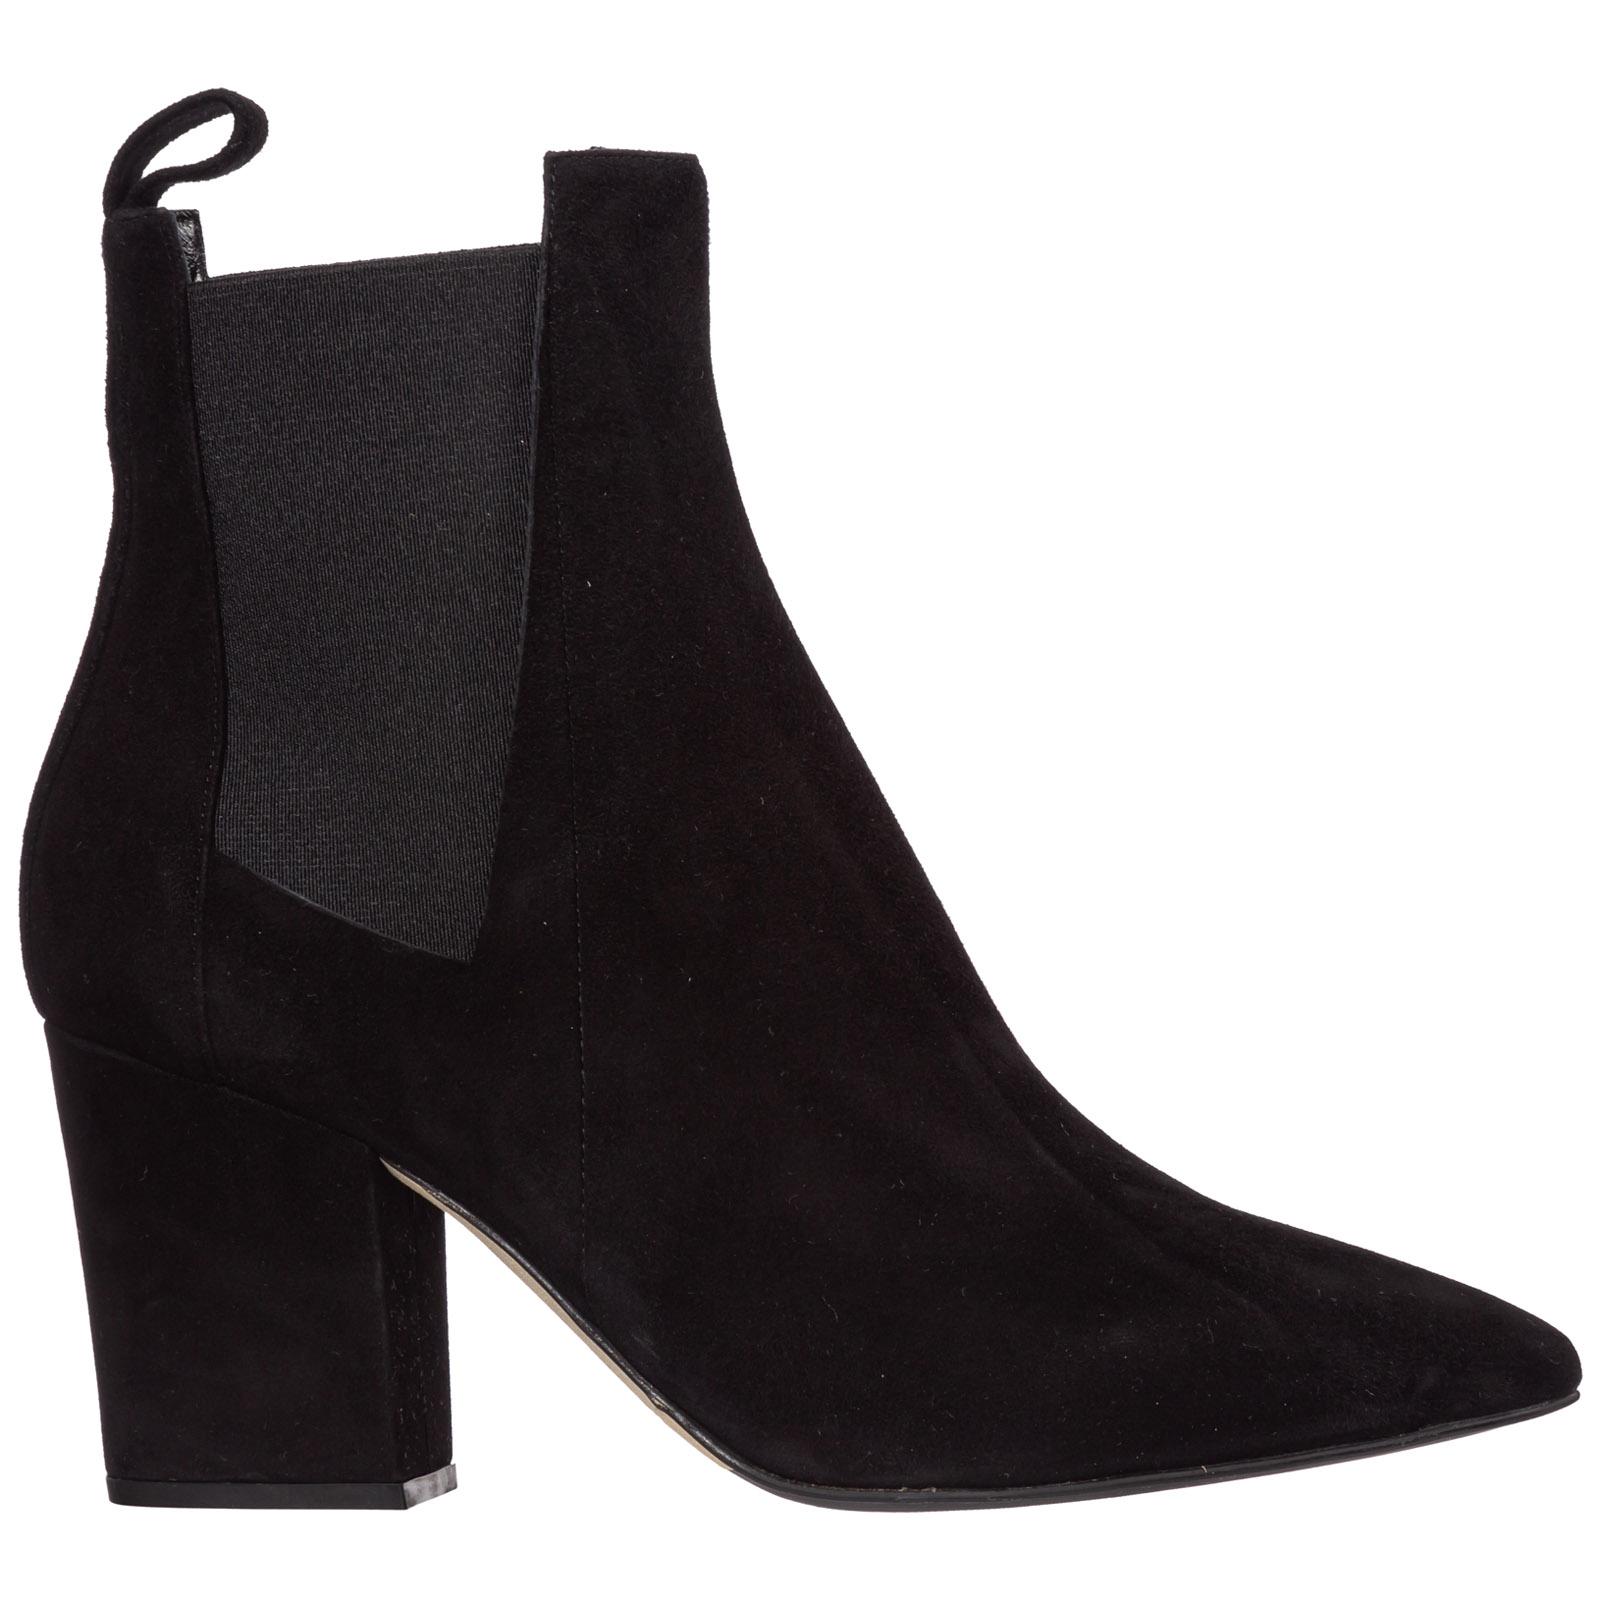 Sergio Rossi Boots WOMEN'S SUEDE HEEL ANKLE BOOTS BOOTIES SERGIO